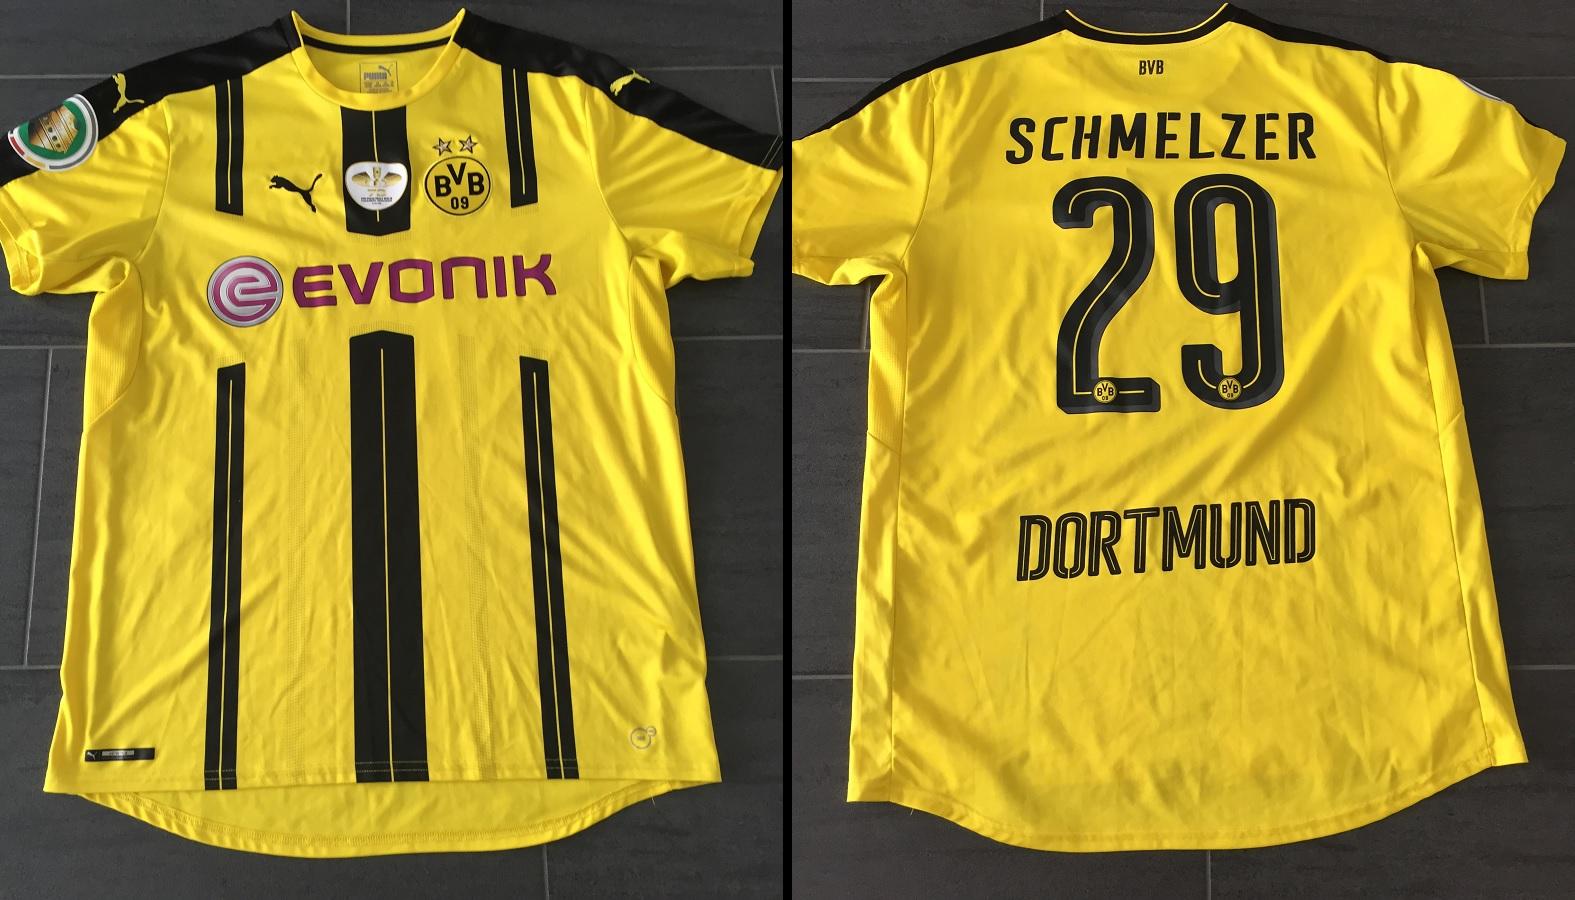 Borussia Dortmund Home 2016/17 Schmelzer